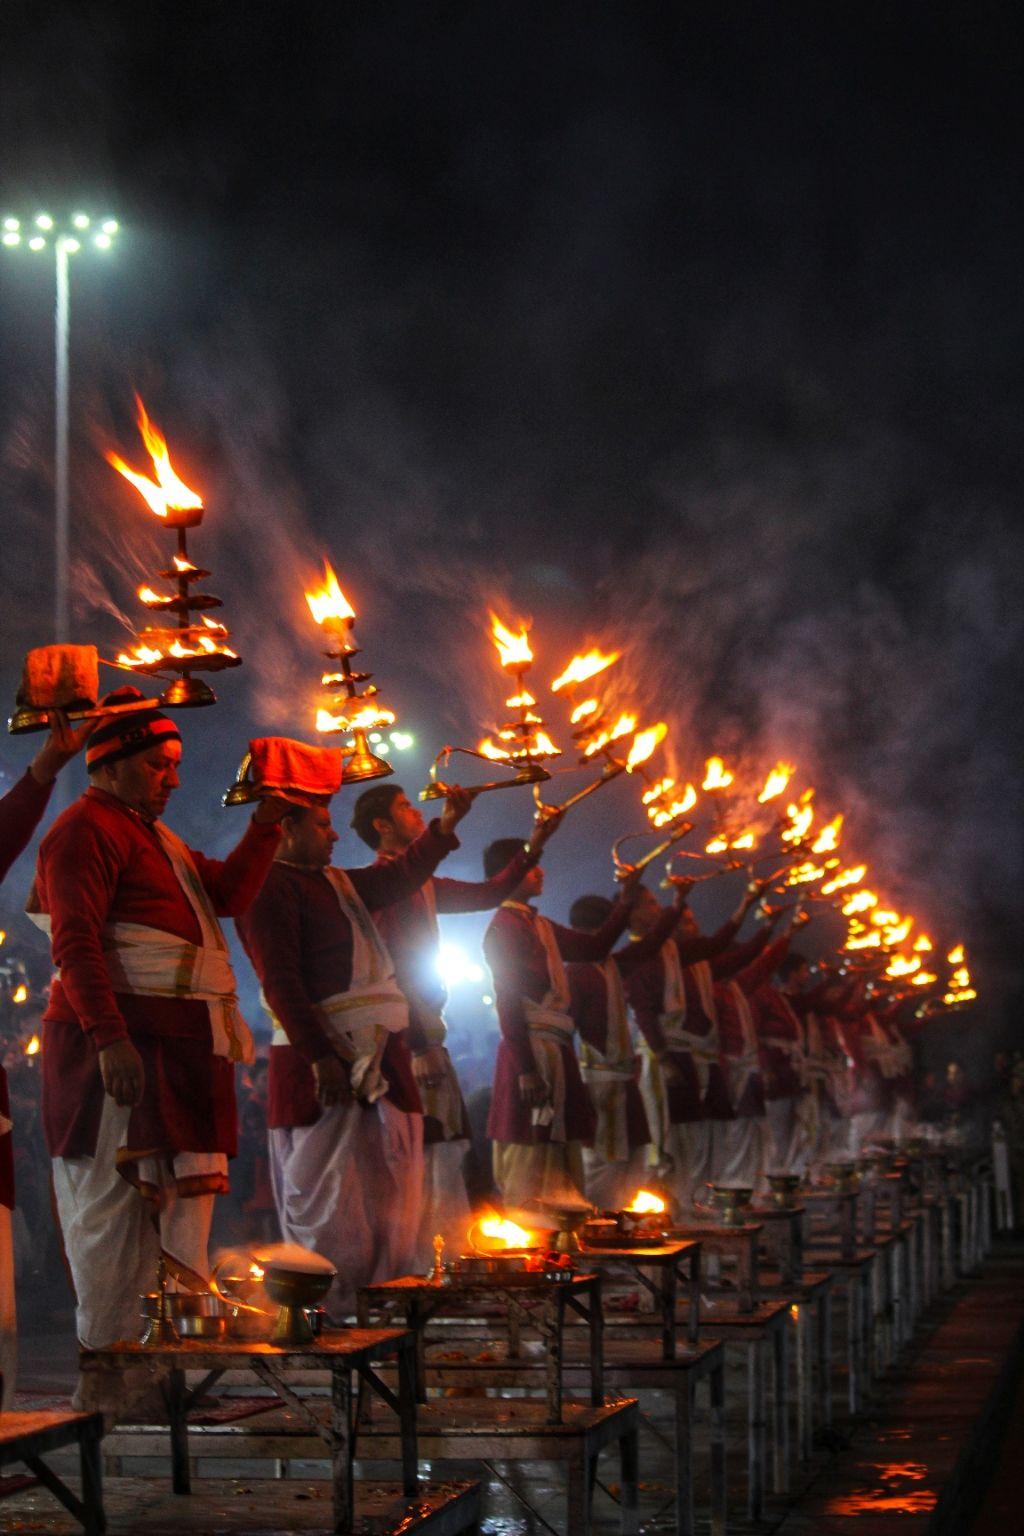 Photo of Triveni Ghat By Smit Prajapati